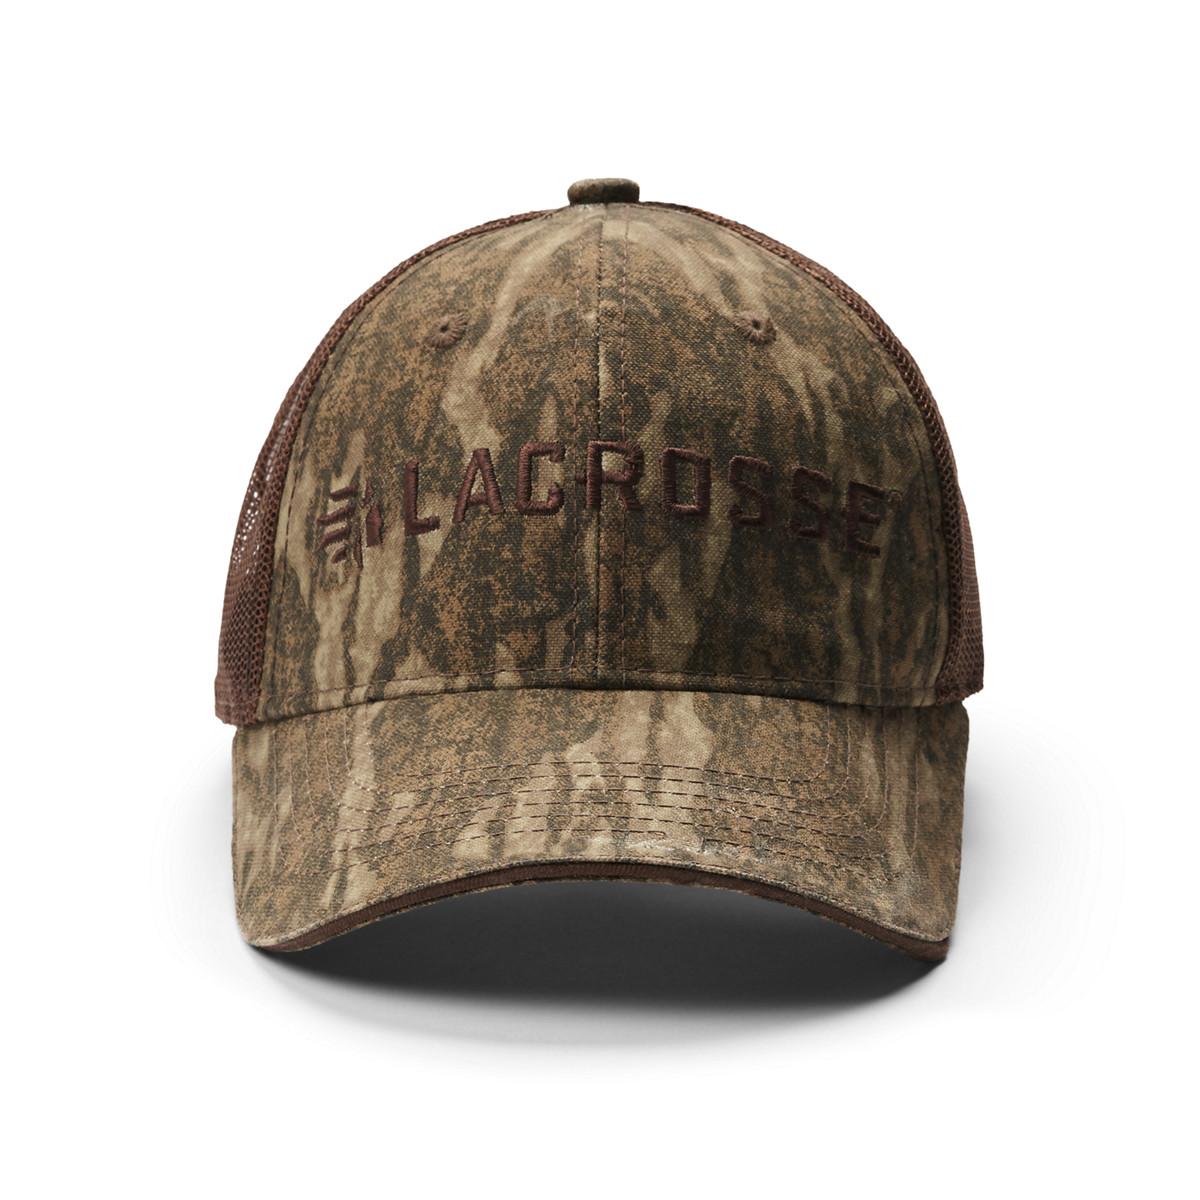 LaCrosse Camo Mesh Back Hat - Mossy Oak Bottomland